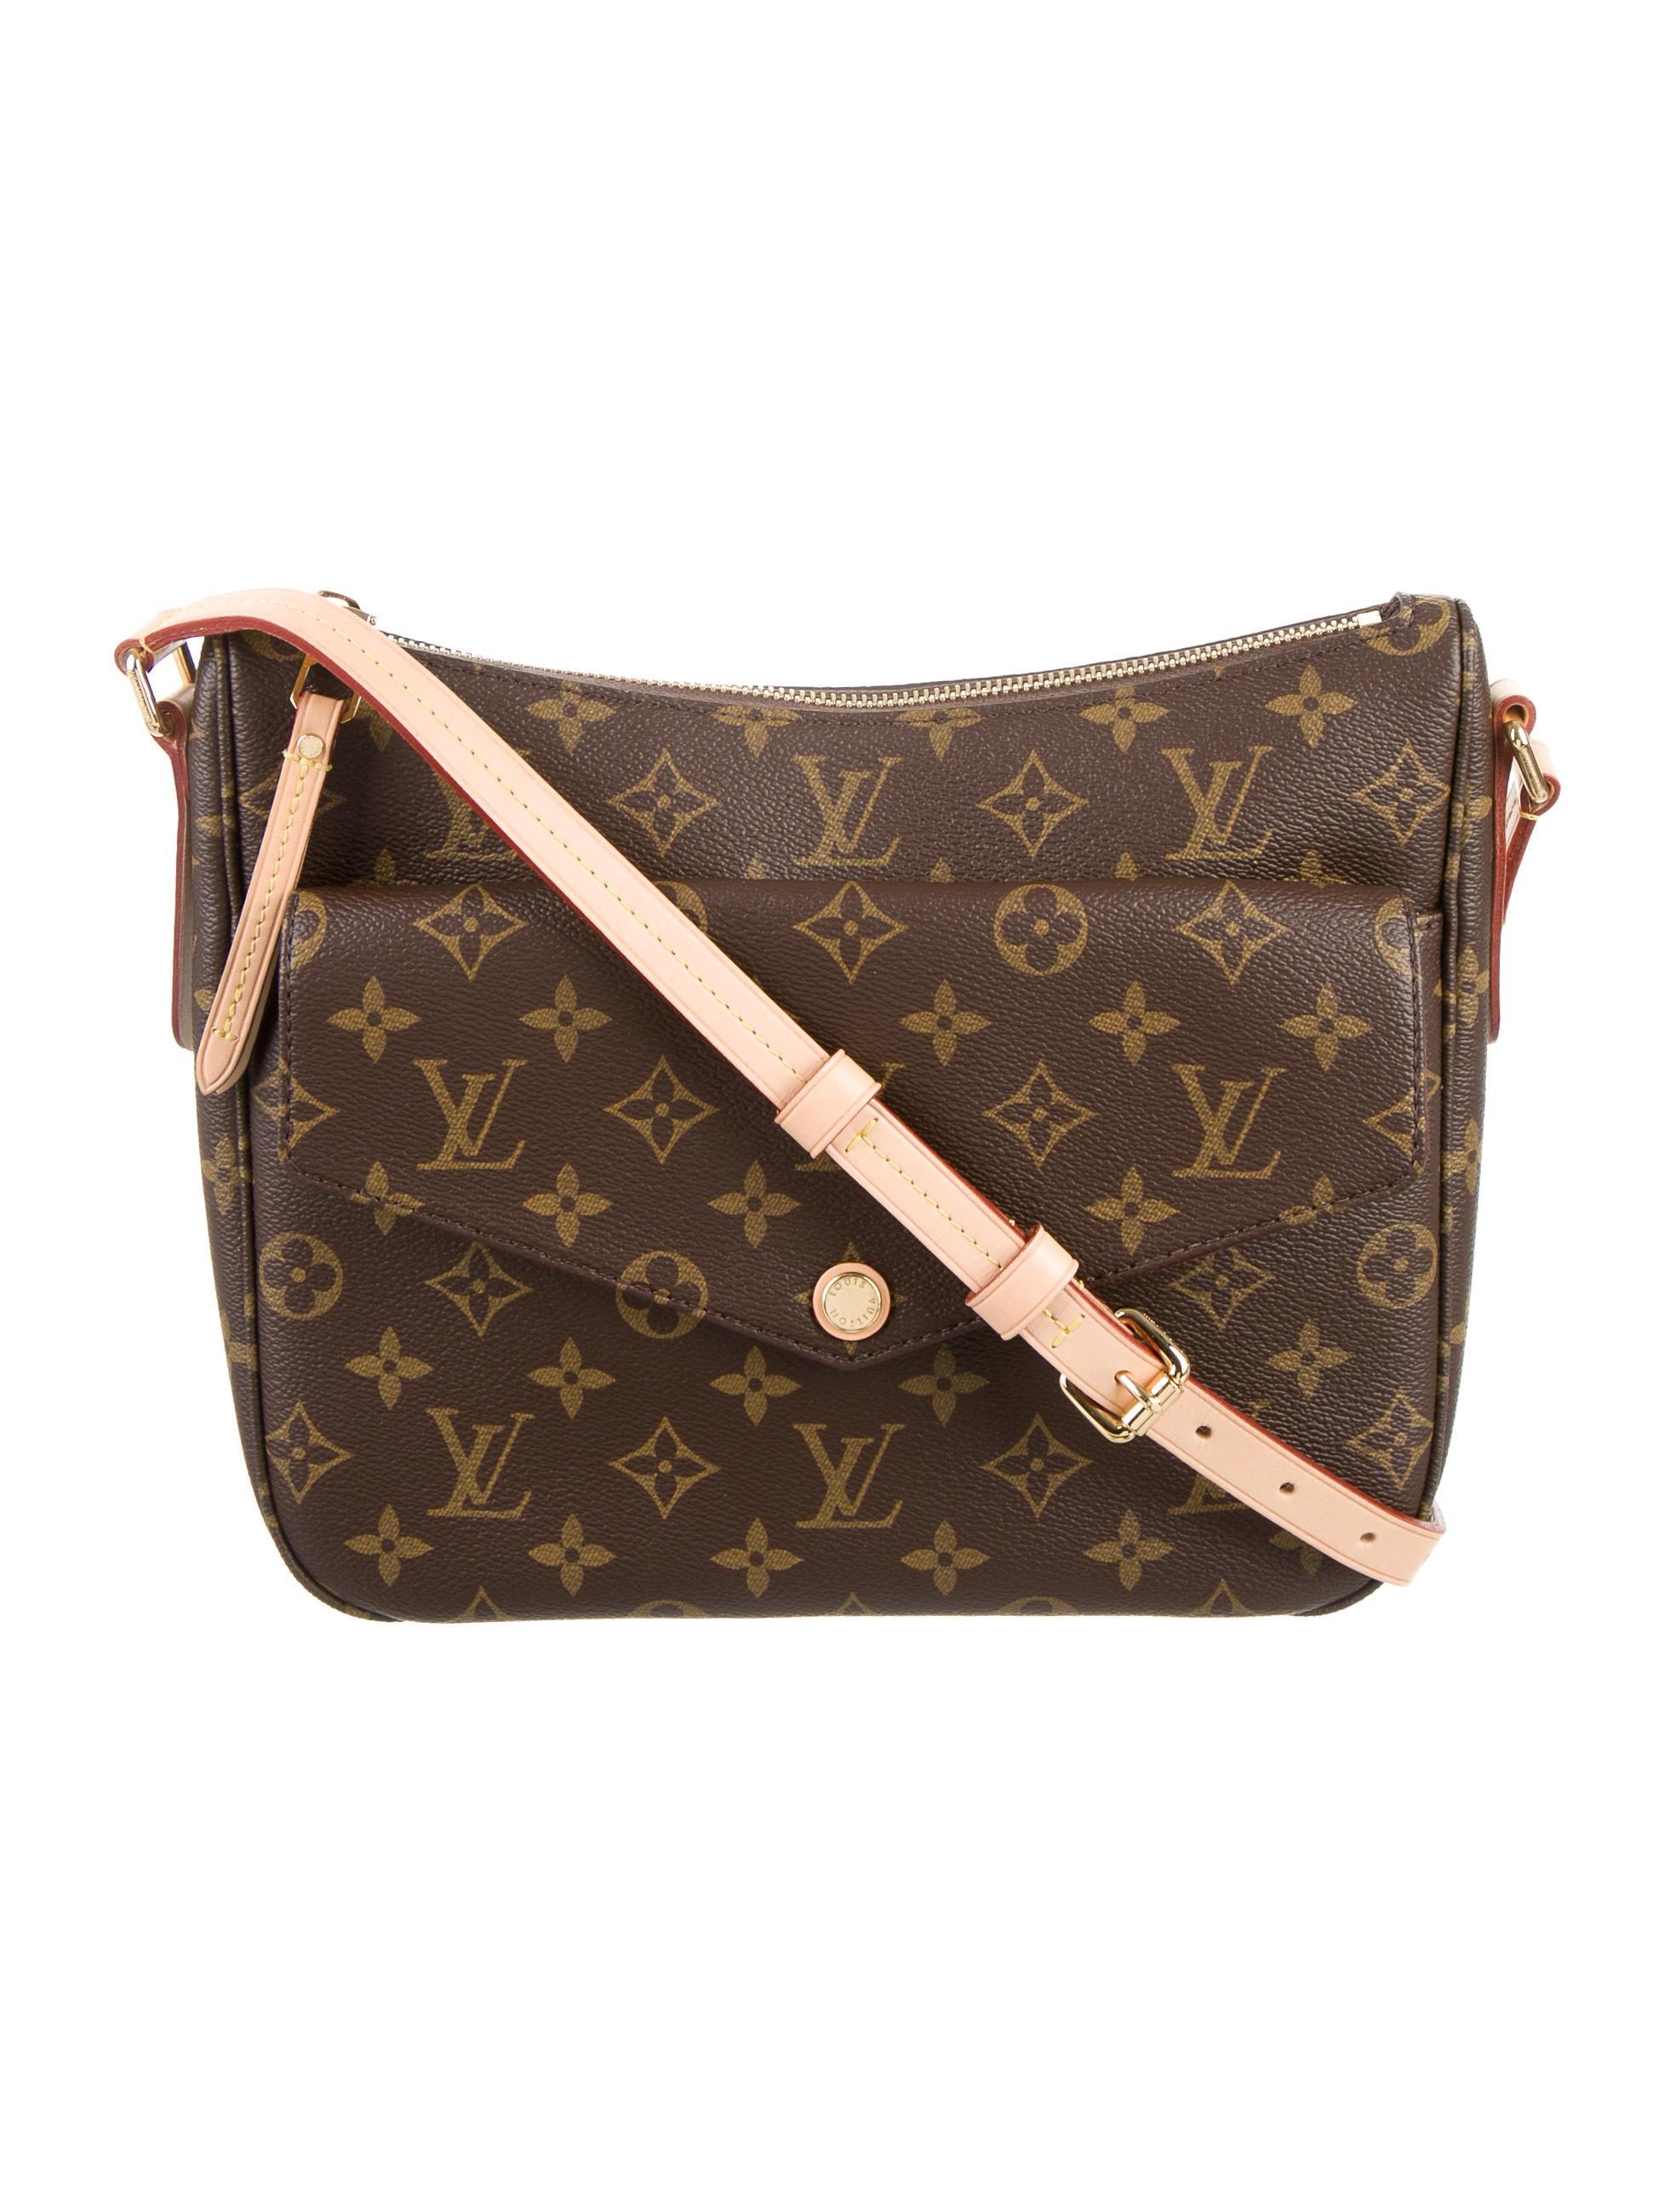 9b66074cb730 Louis Vuitton 2016 Monogram Mabillon Crossbody Bag - Handbags ...